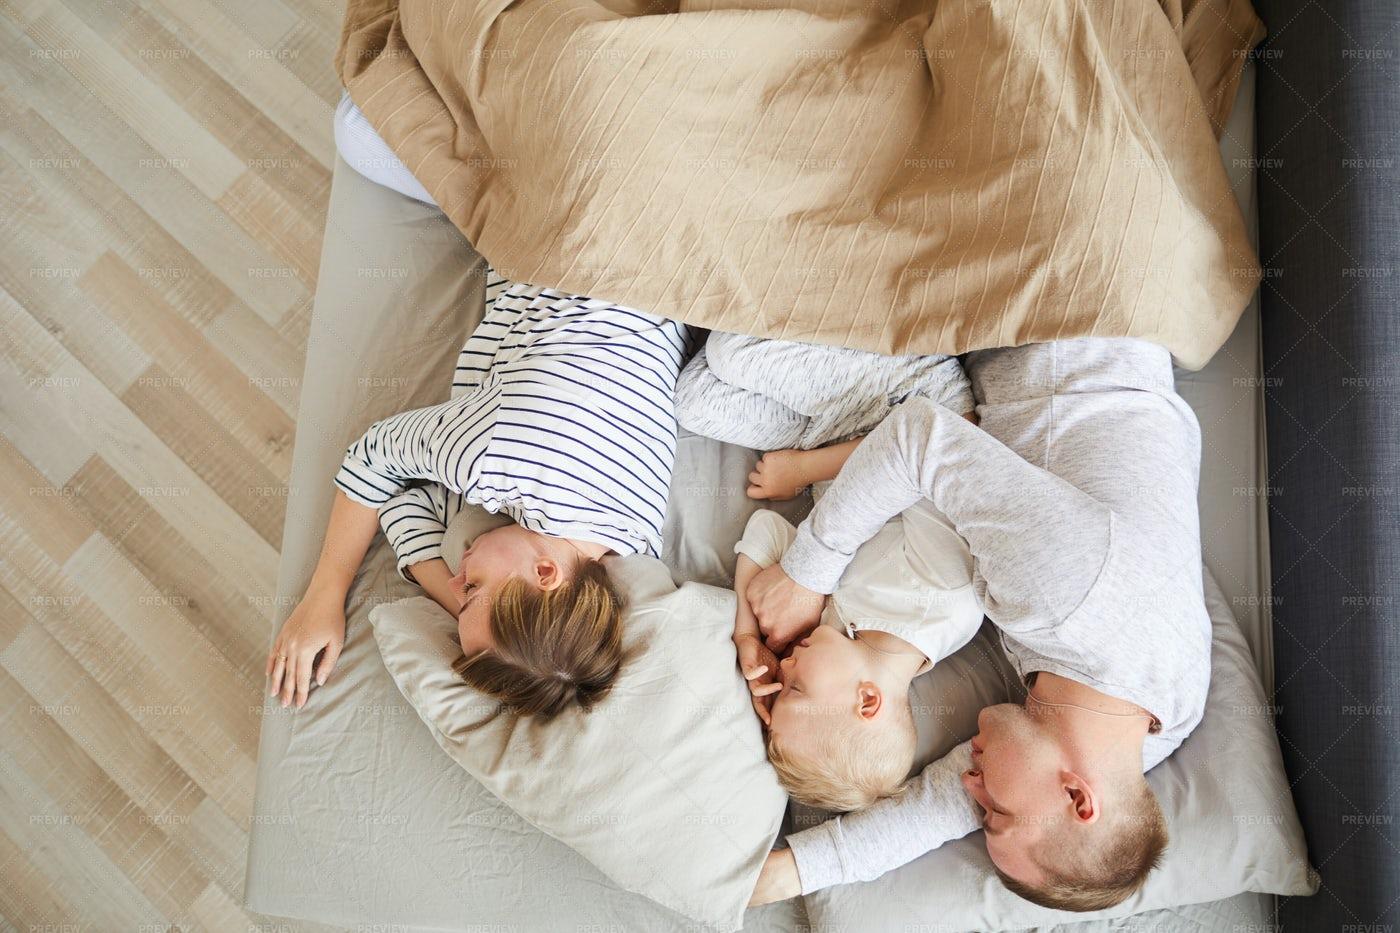 Family Sleeping On Comfortable...: Stock Photos